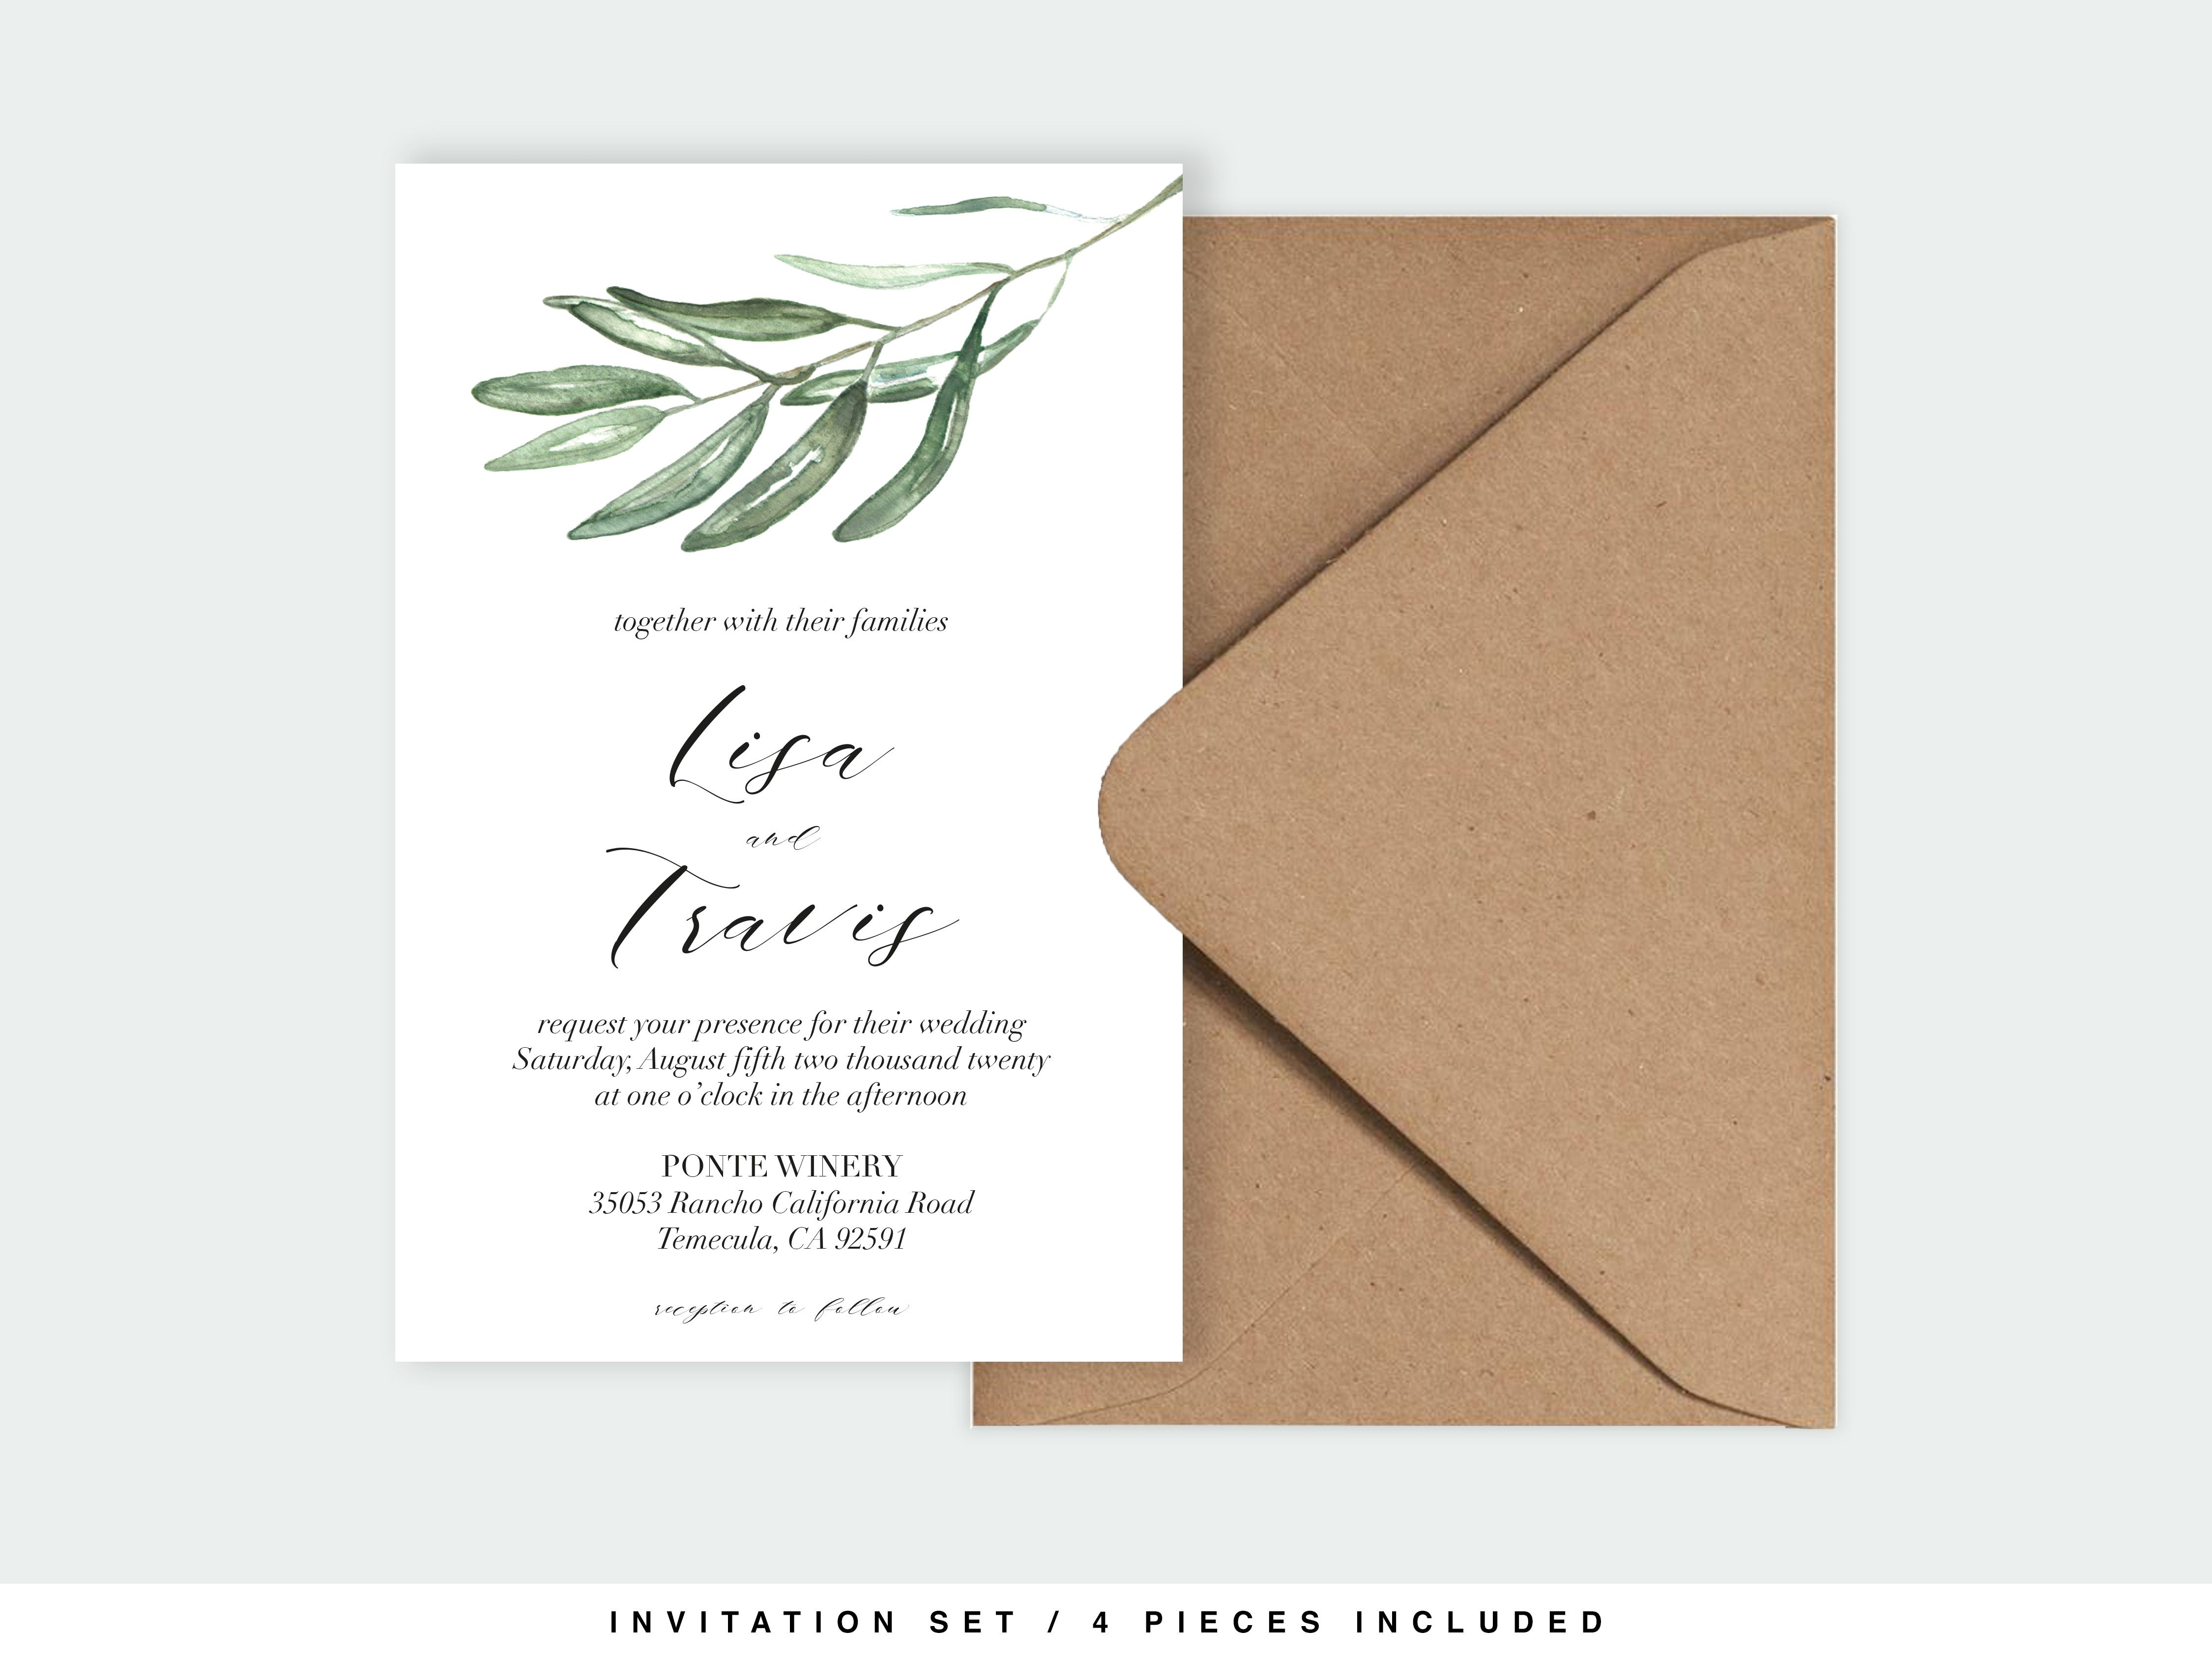 Greenery Wedding Invitation Template Suite